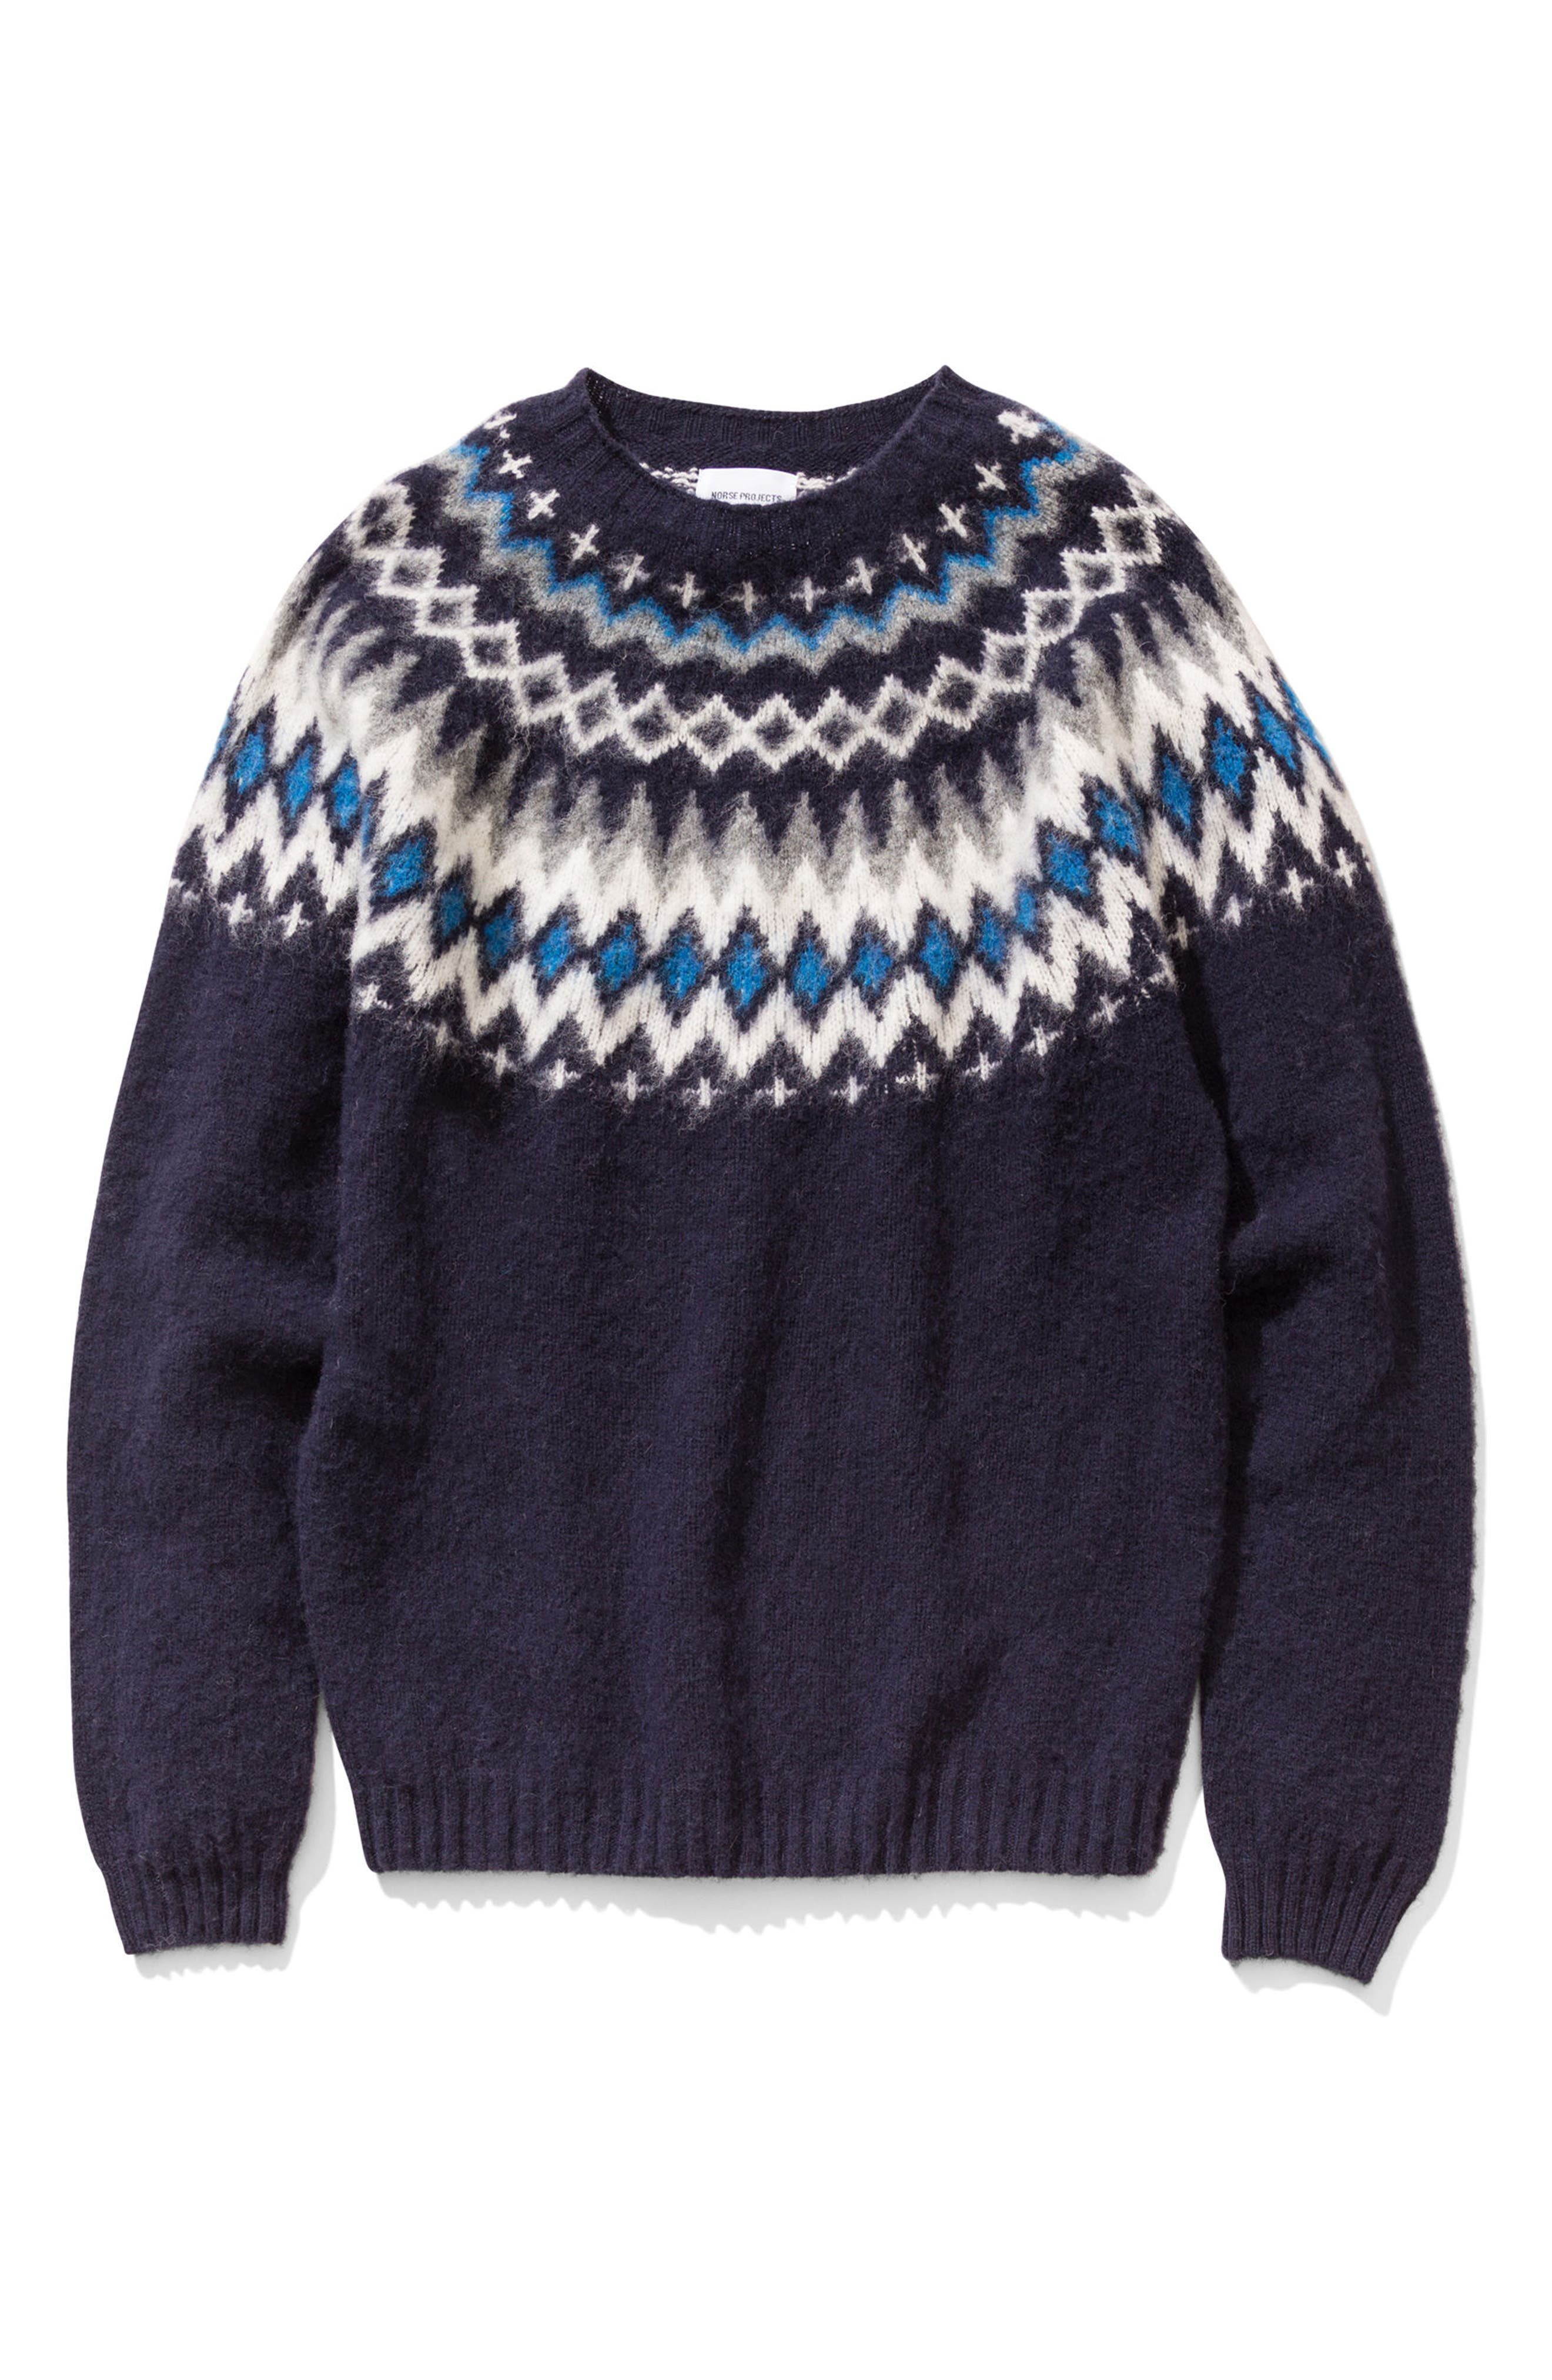 Nirnir Fair Isle Lambswool Sweater,                             Alternate thumbnail 10, color,